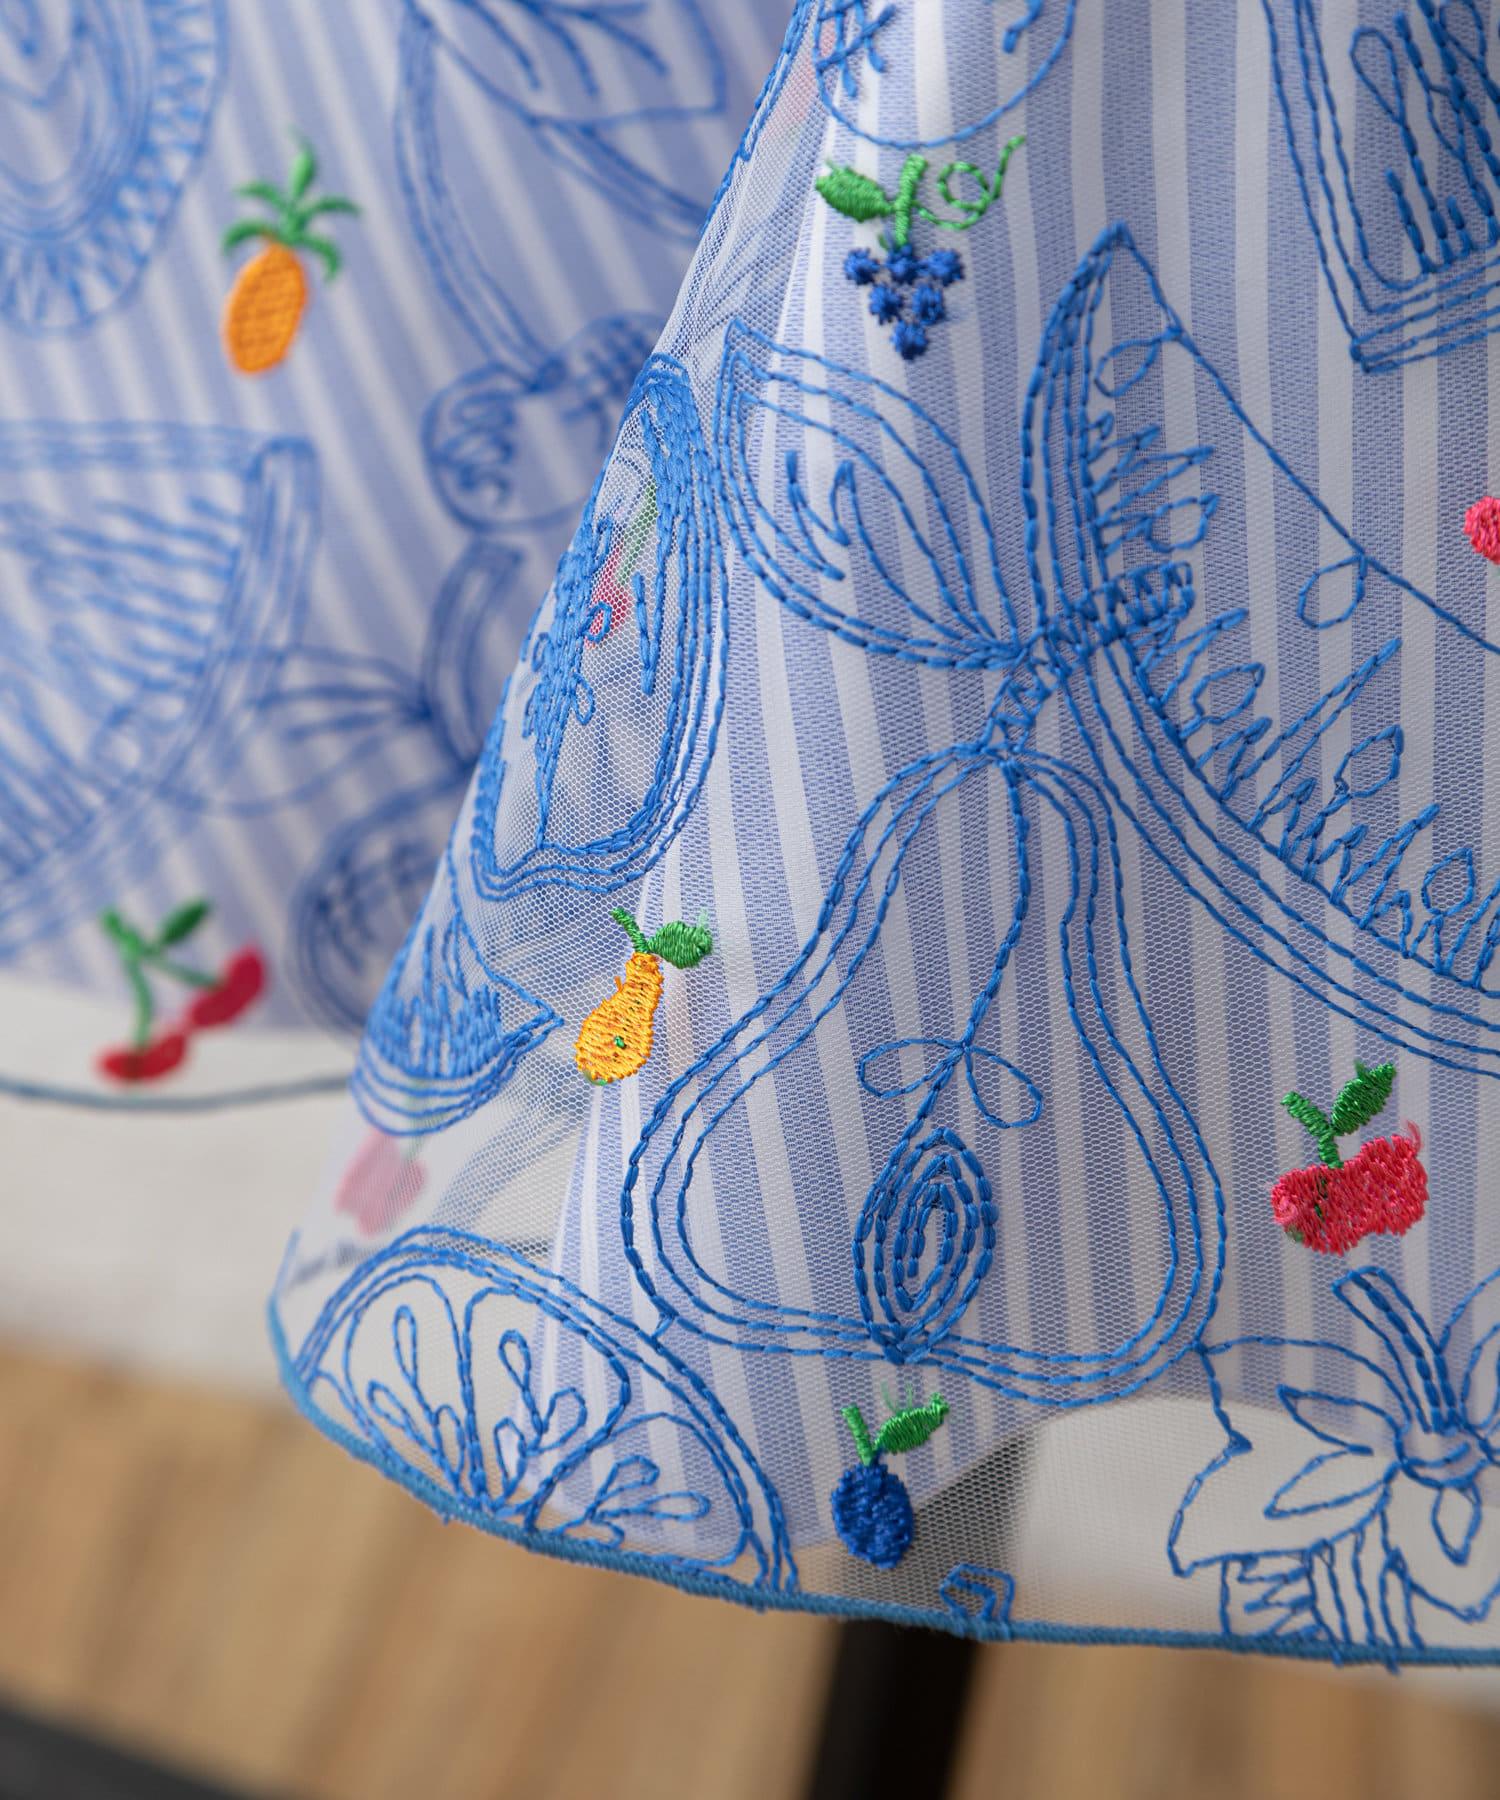 BEARDSLEY(ビアズリー) フルーツ刺繍ワンピース